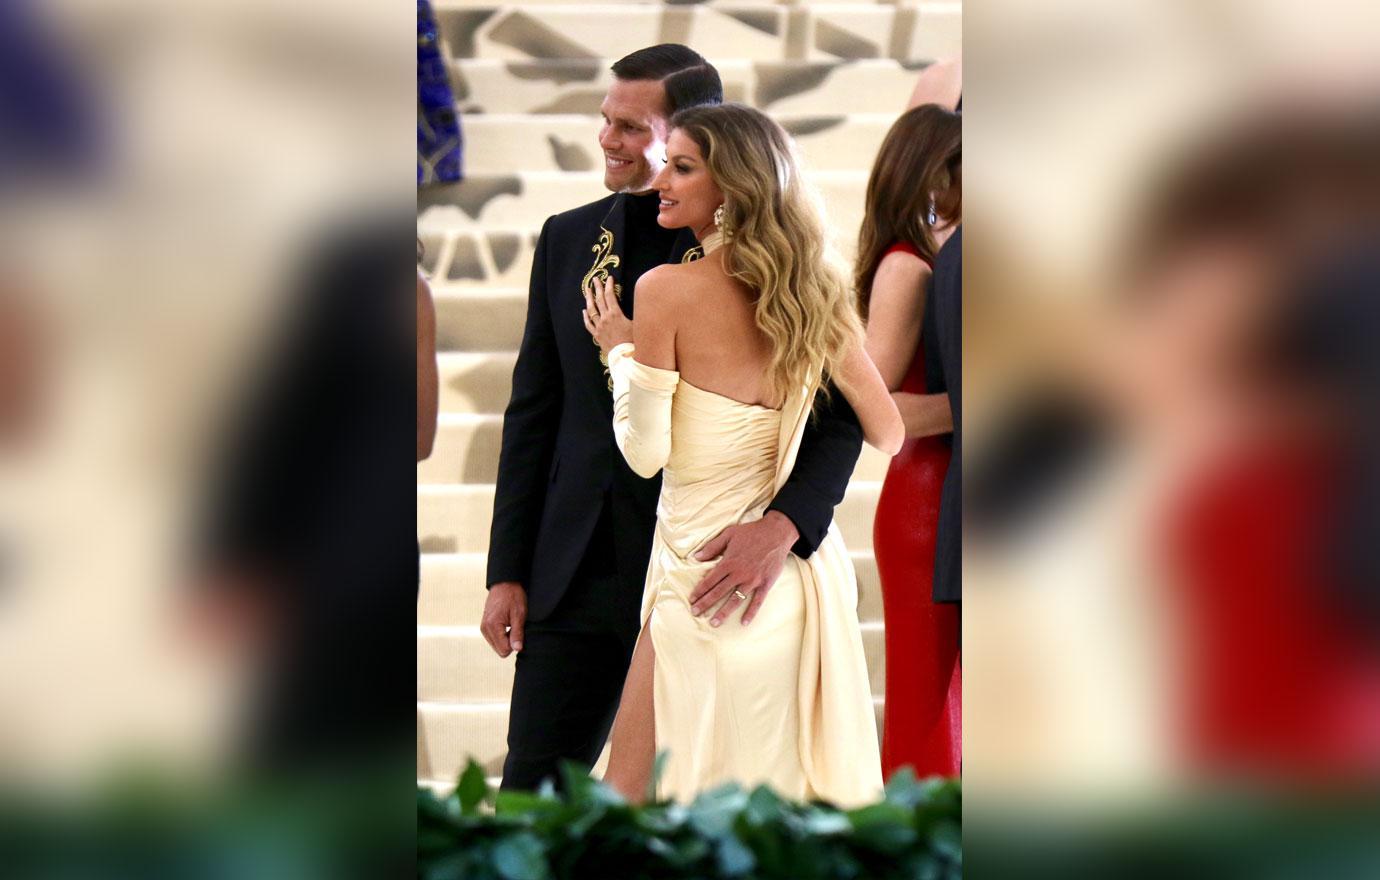 Tom Brady Gisele Bundchen Celebrate Their 11th Wedding Anniversary